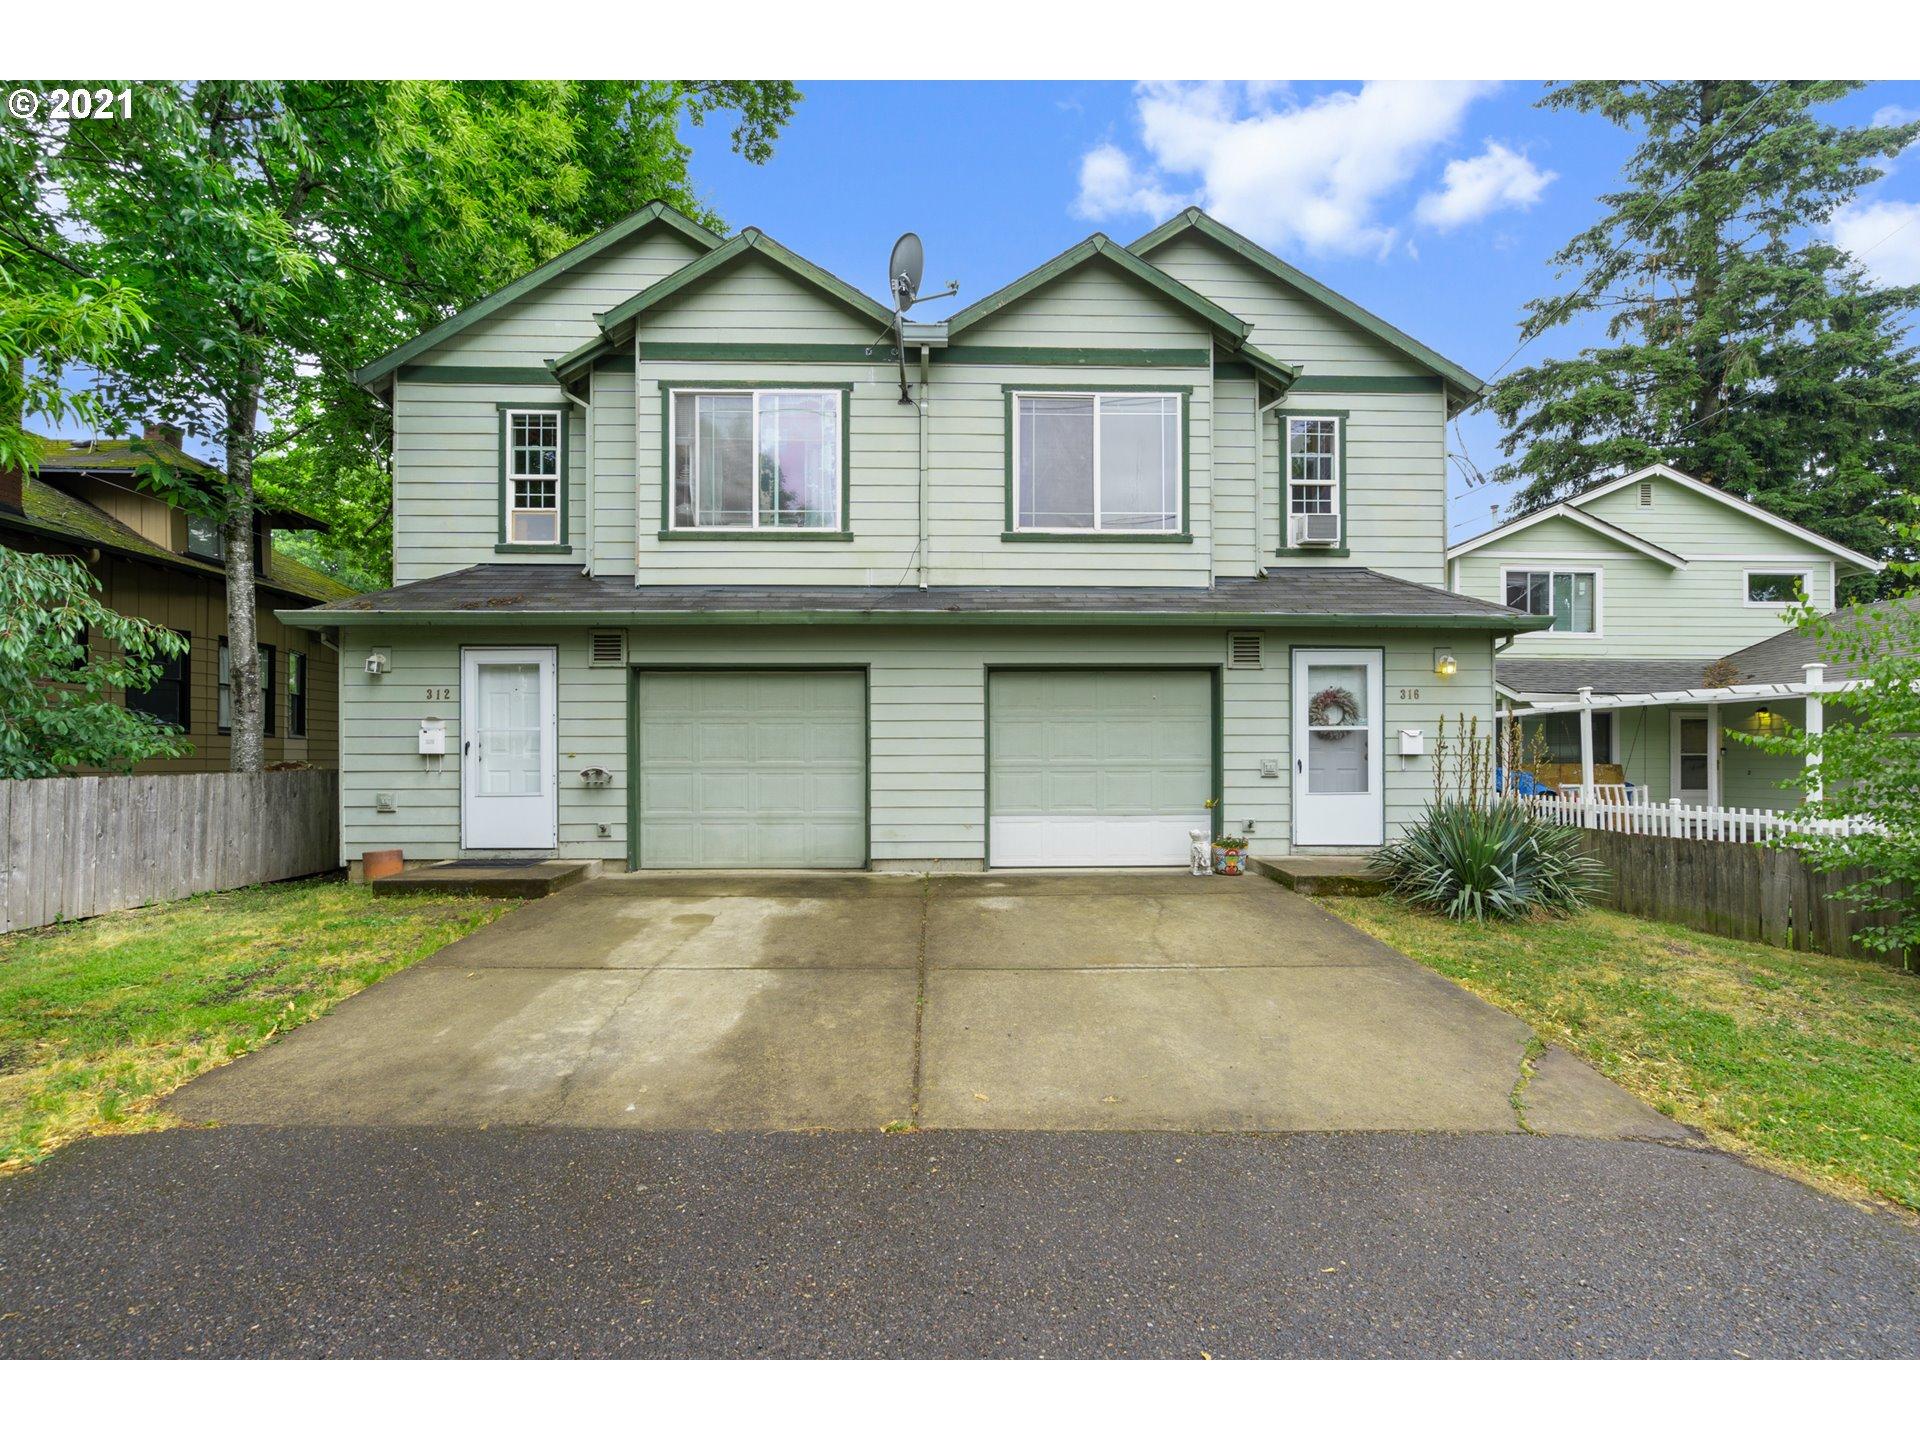 312/316 SE 88TH AVE, Portland OR 97216